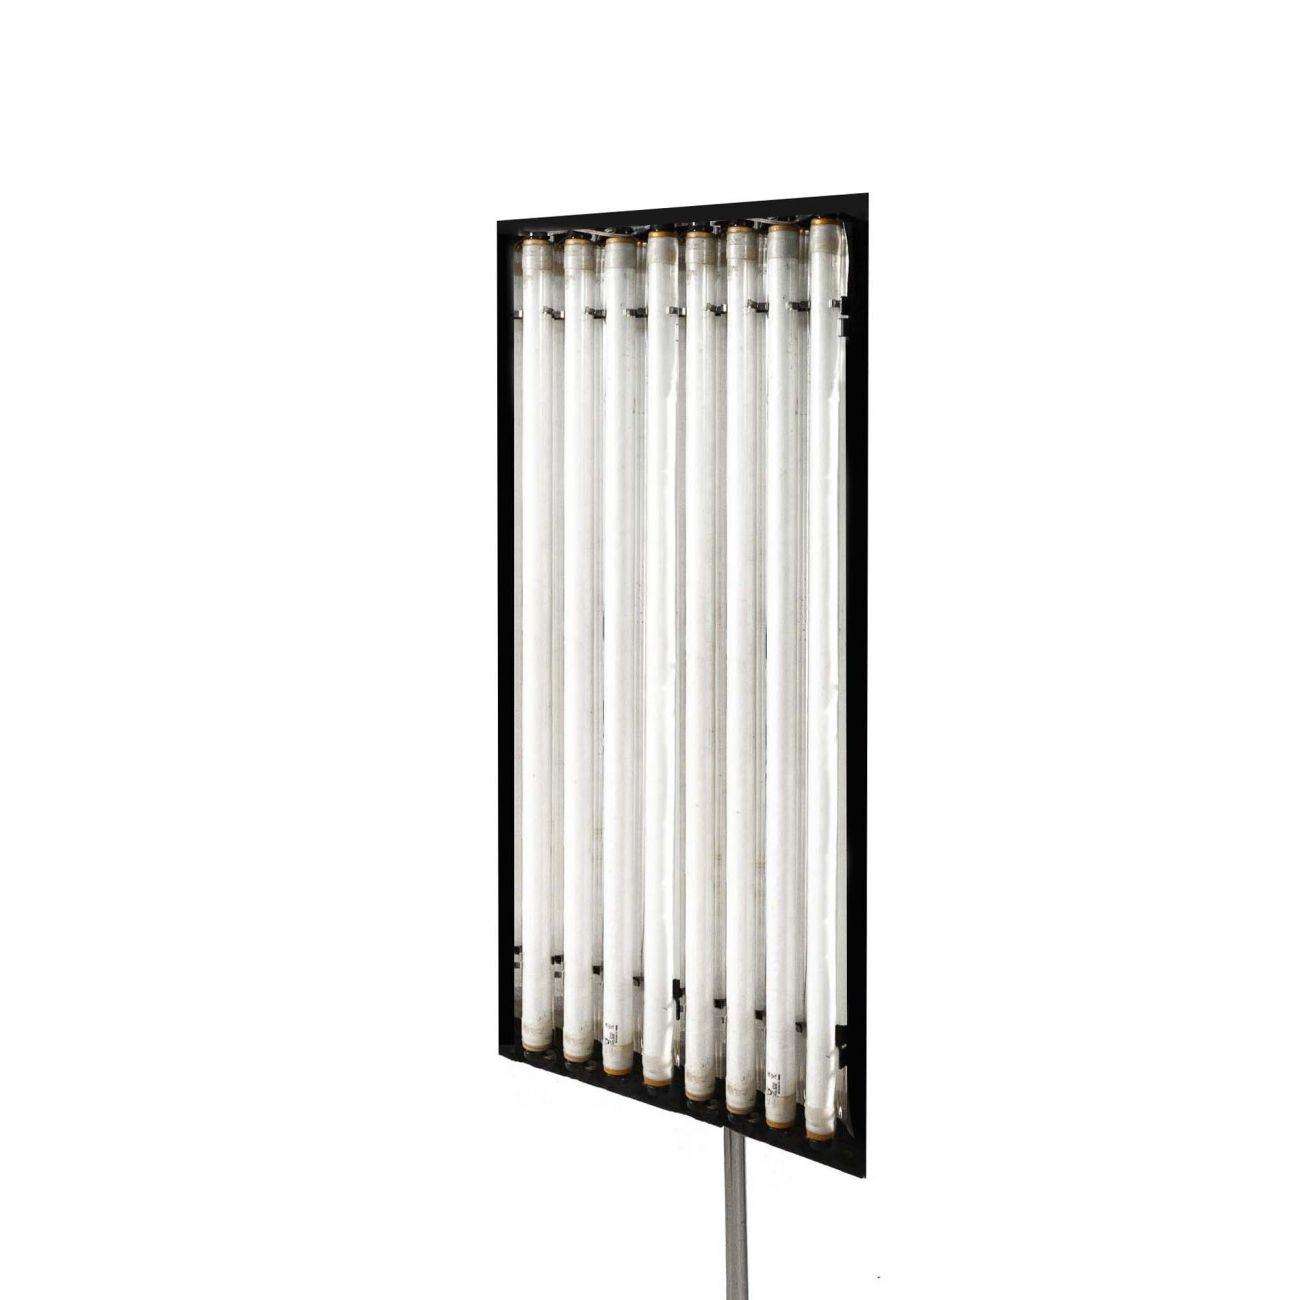 KinoFlo FlatHead 4ft x 8lamps